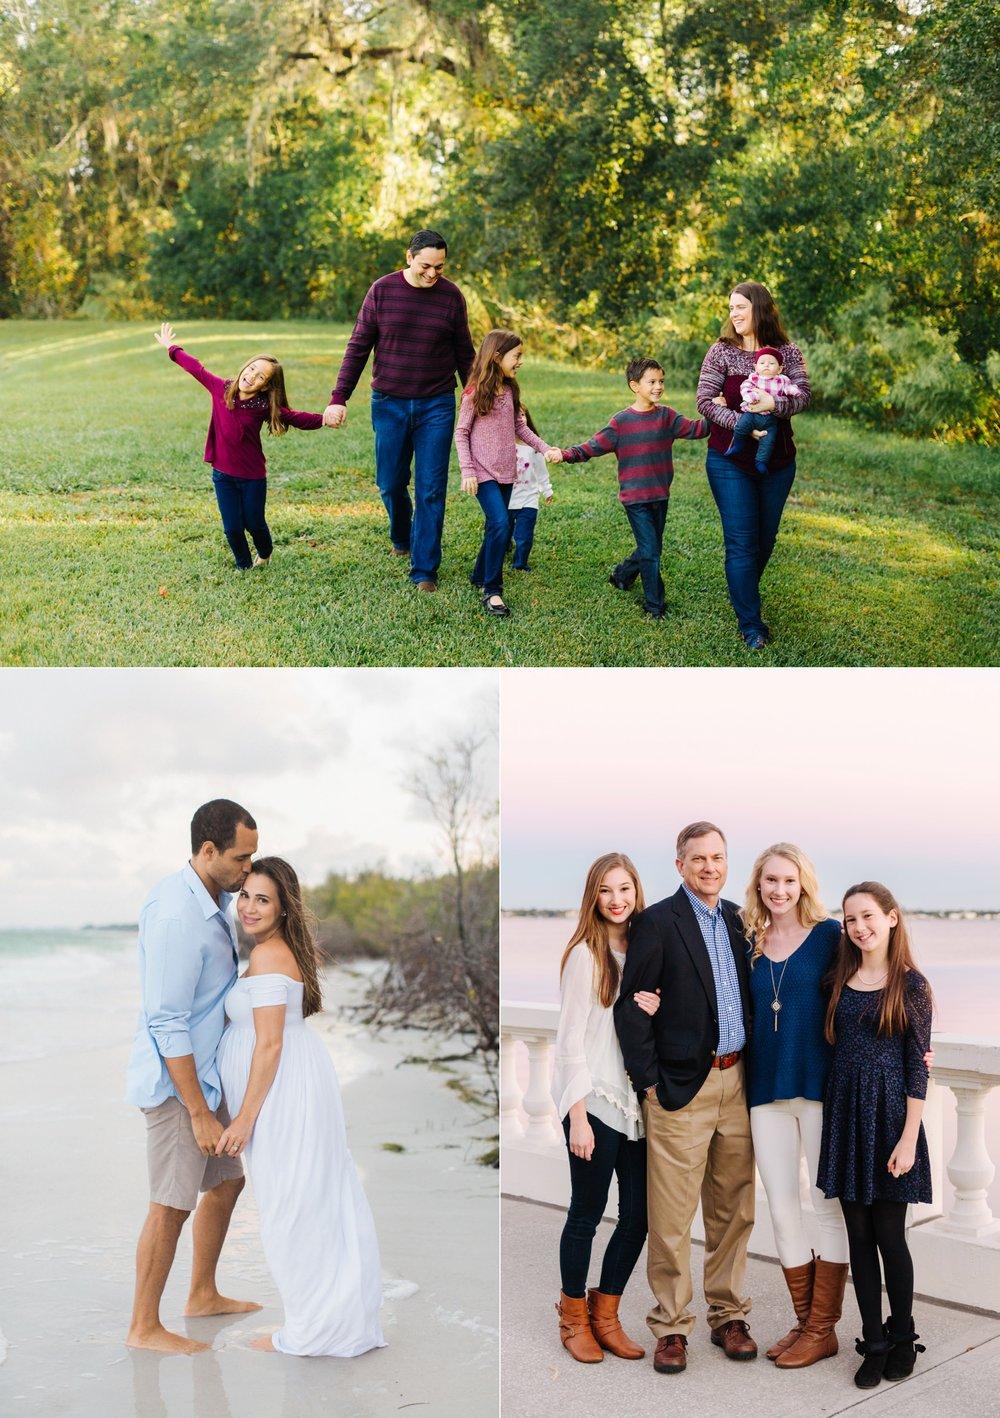 Jake & Katie's Best of Families 2016-015.jpg